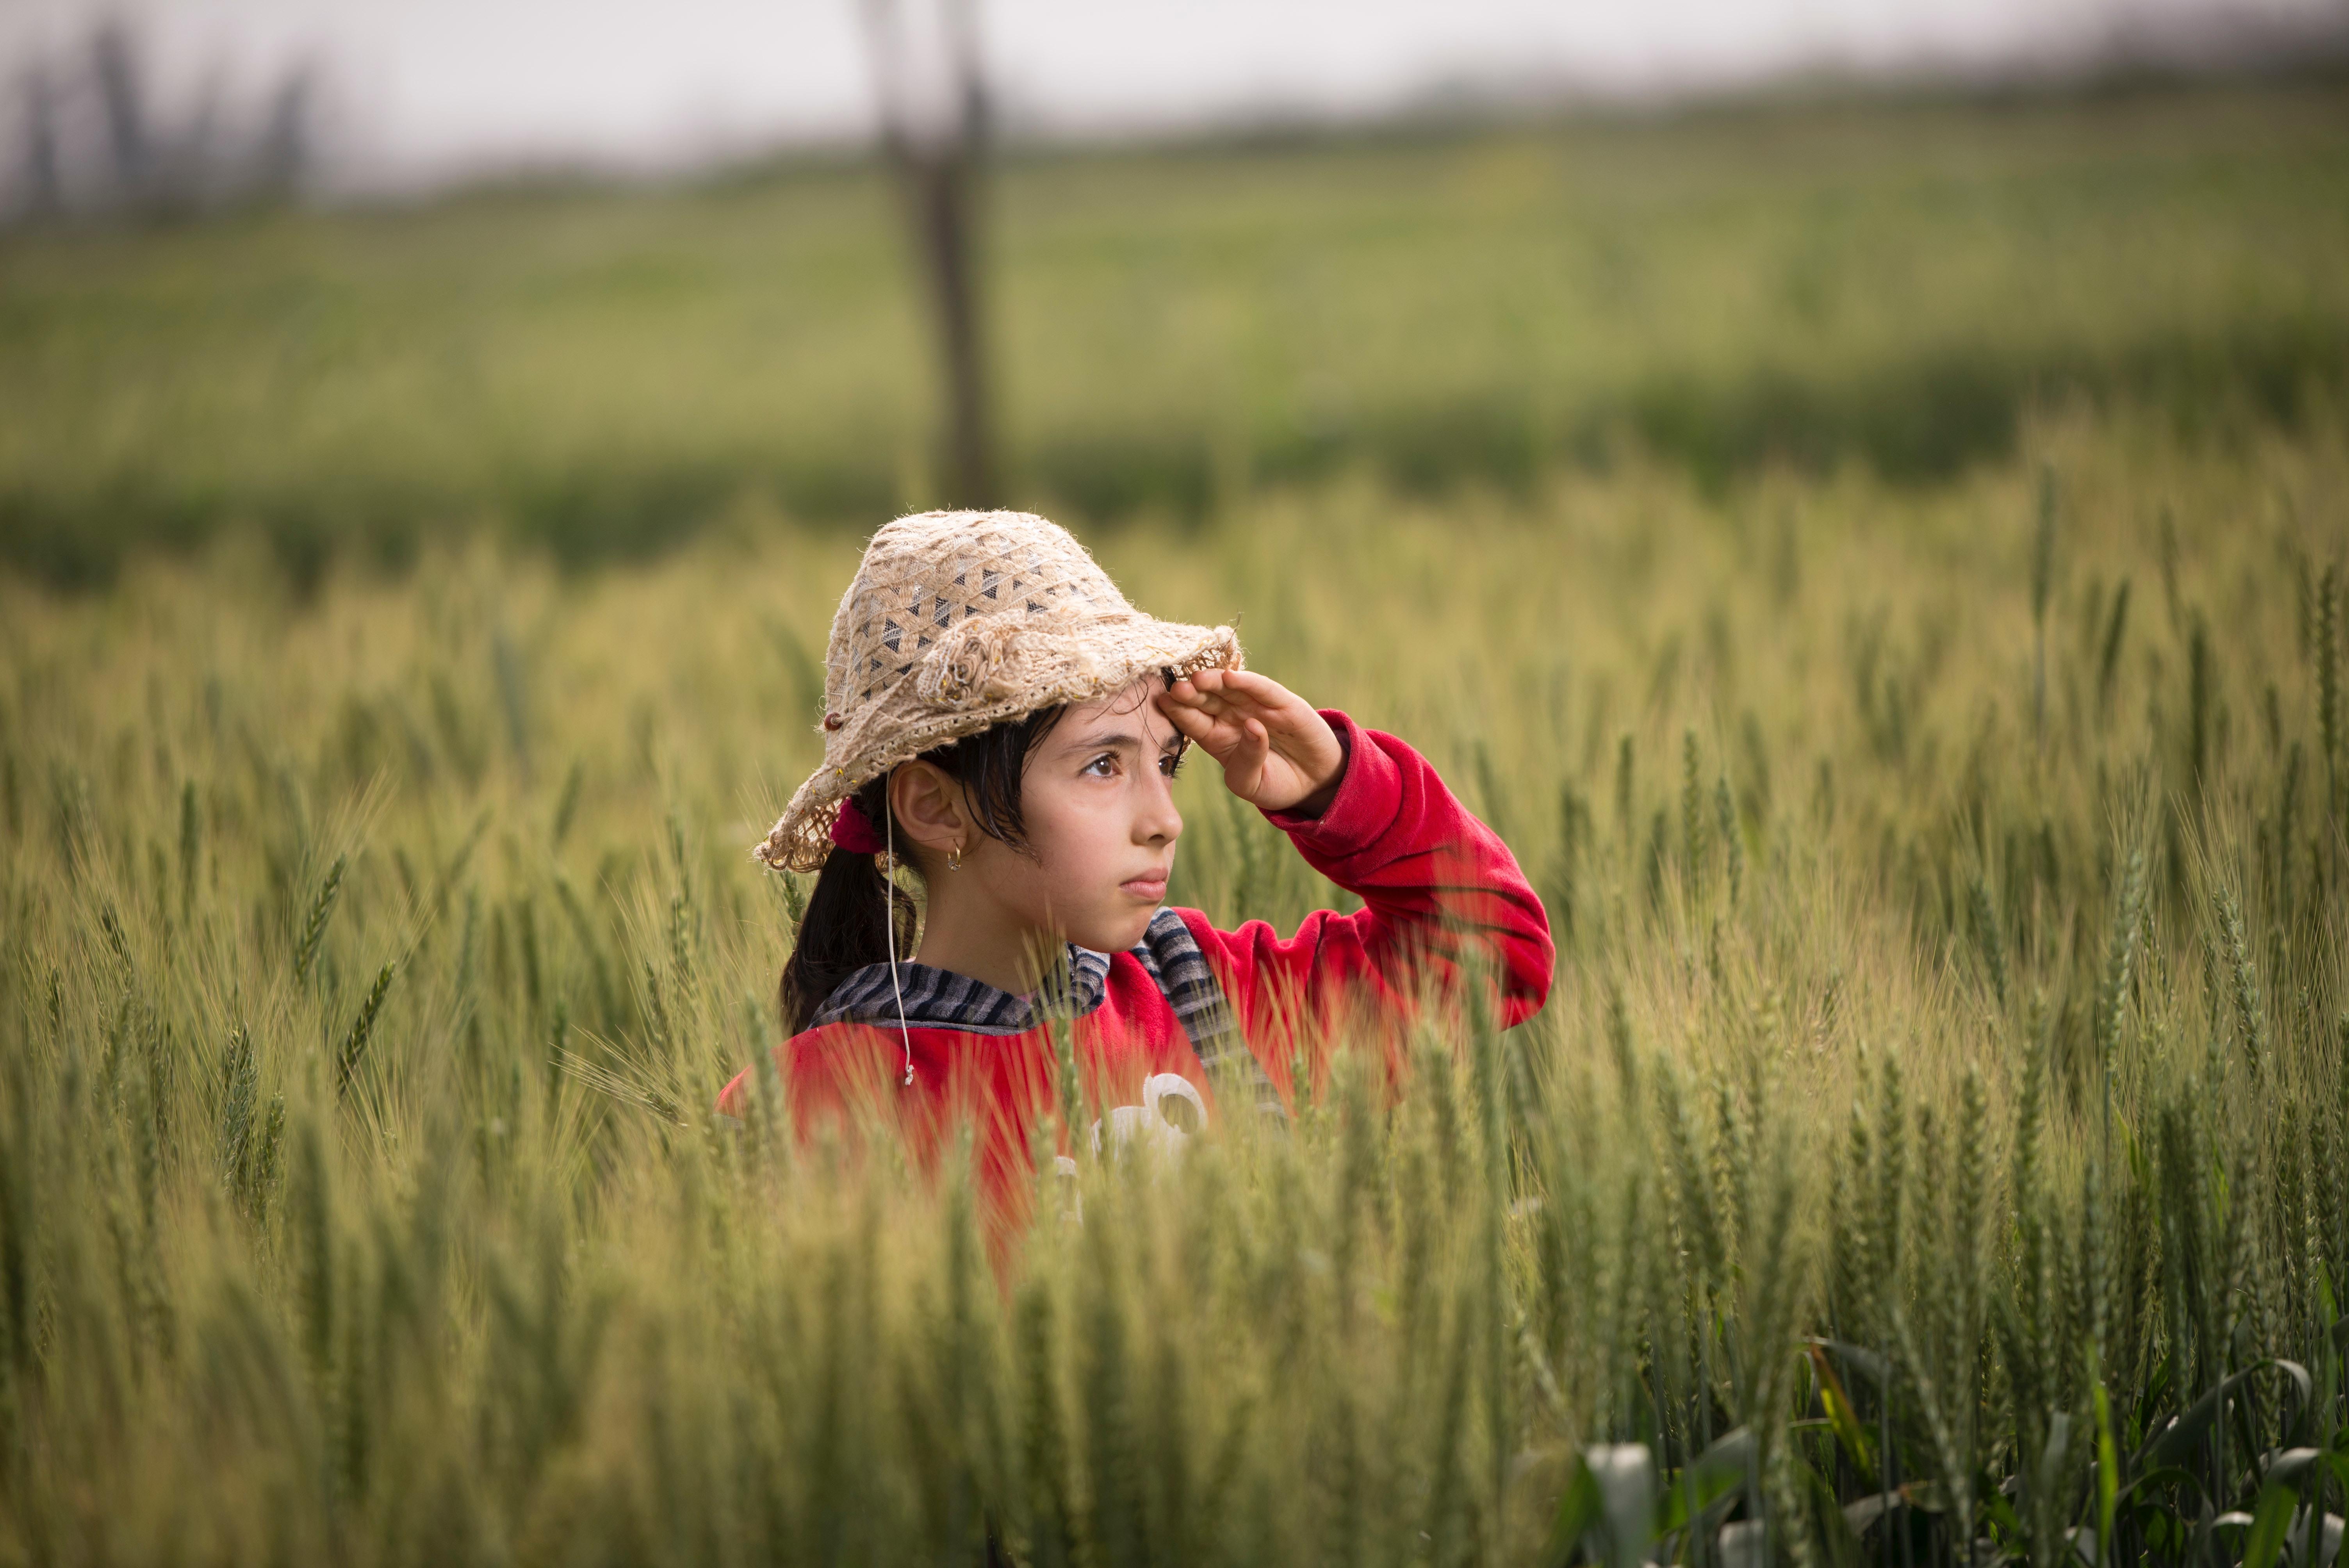 Girl in red hoodie wearing beige sunhat photo